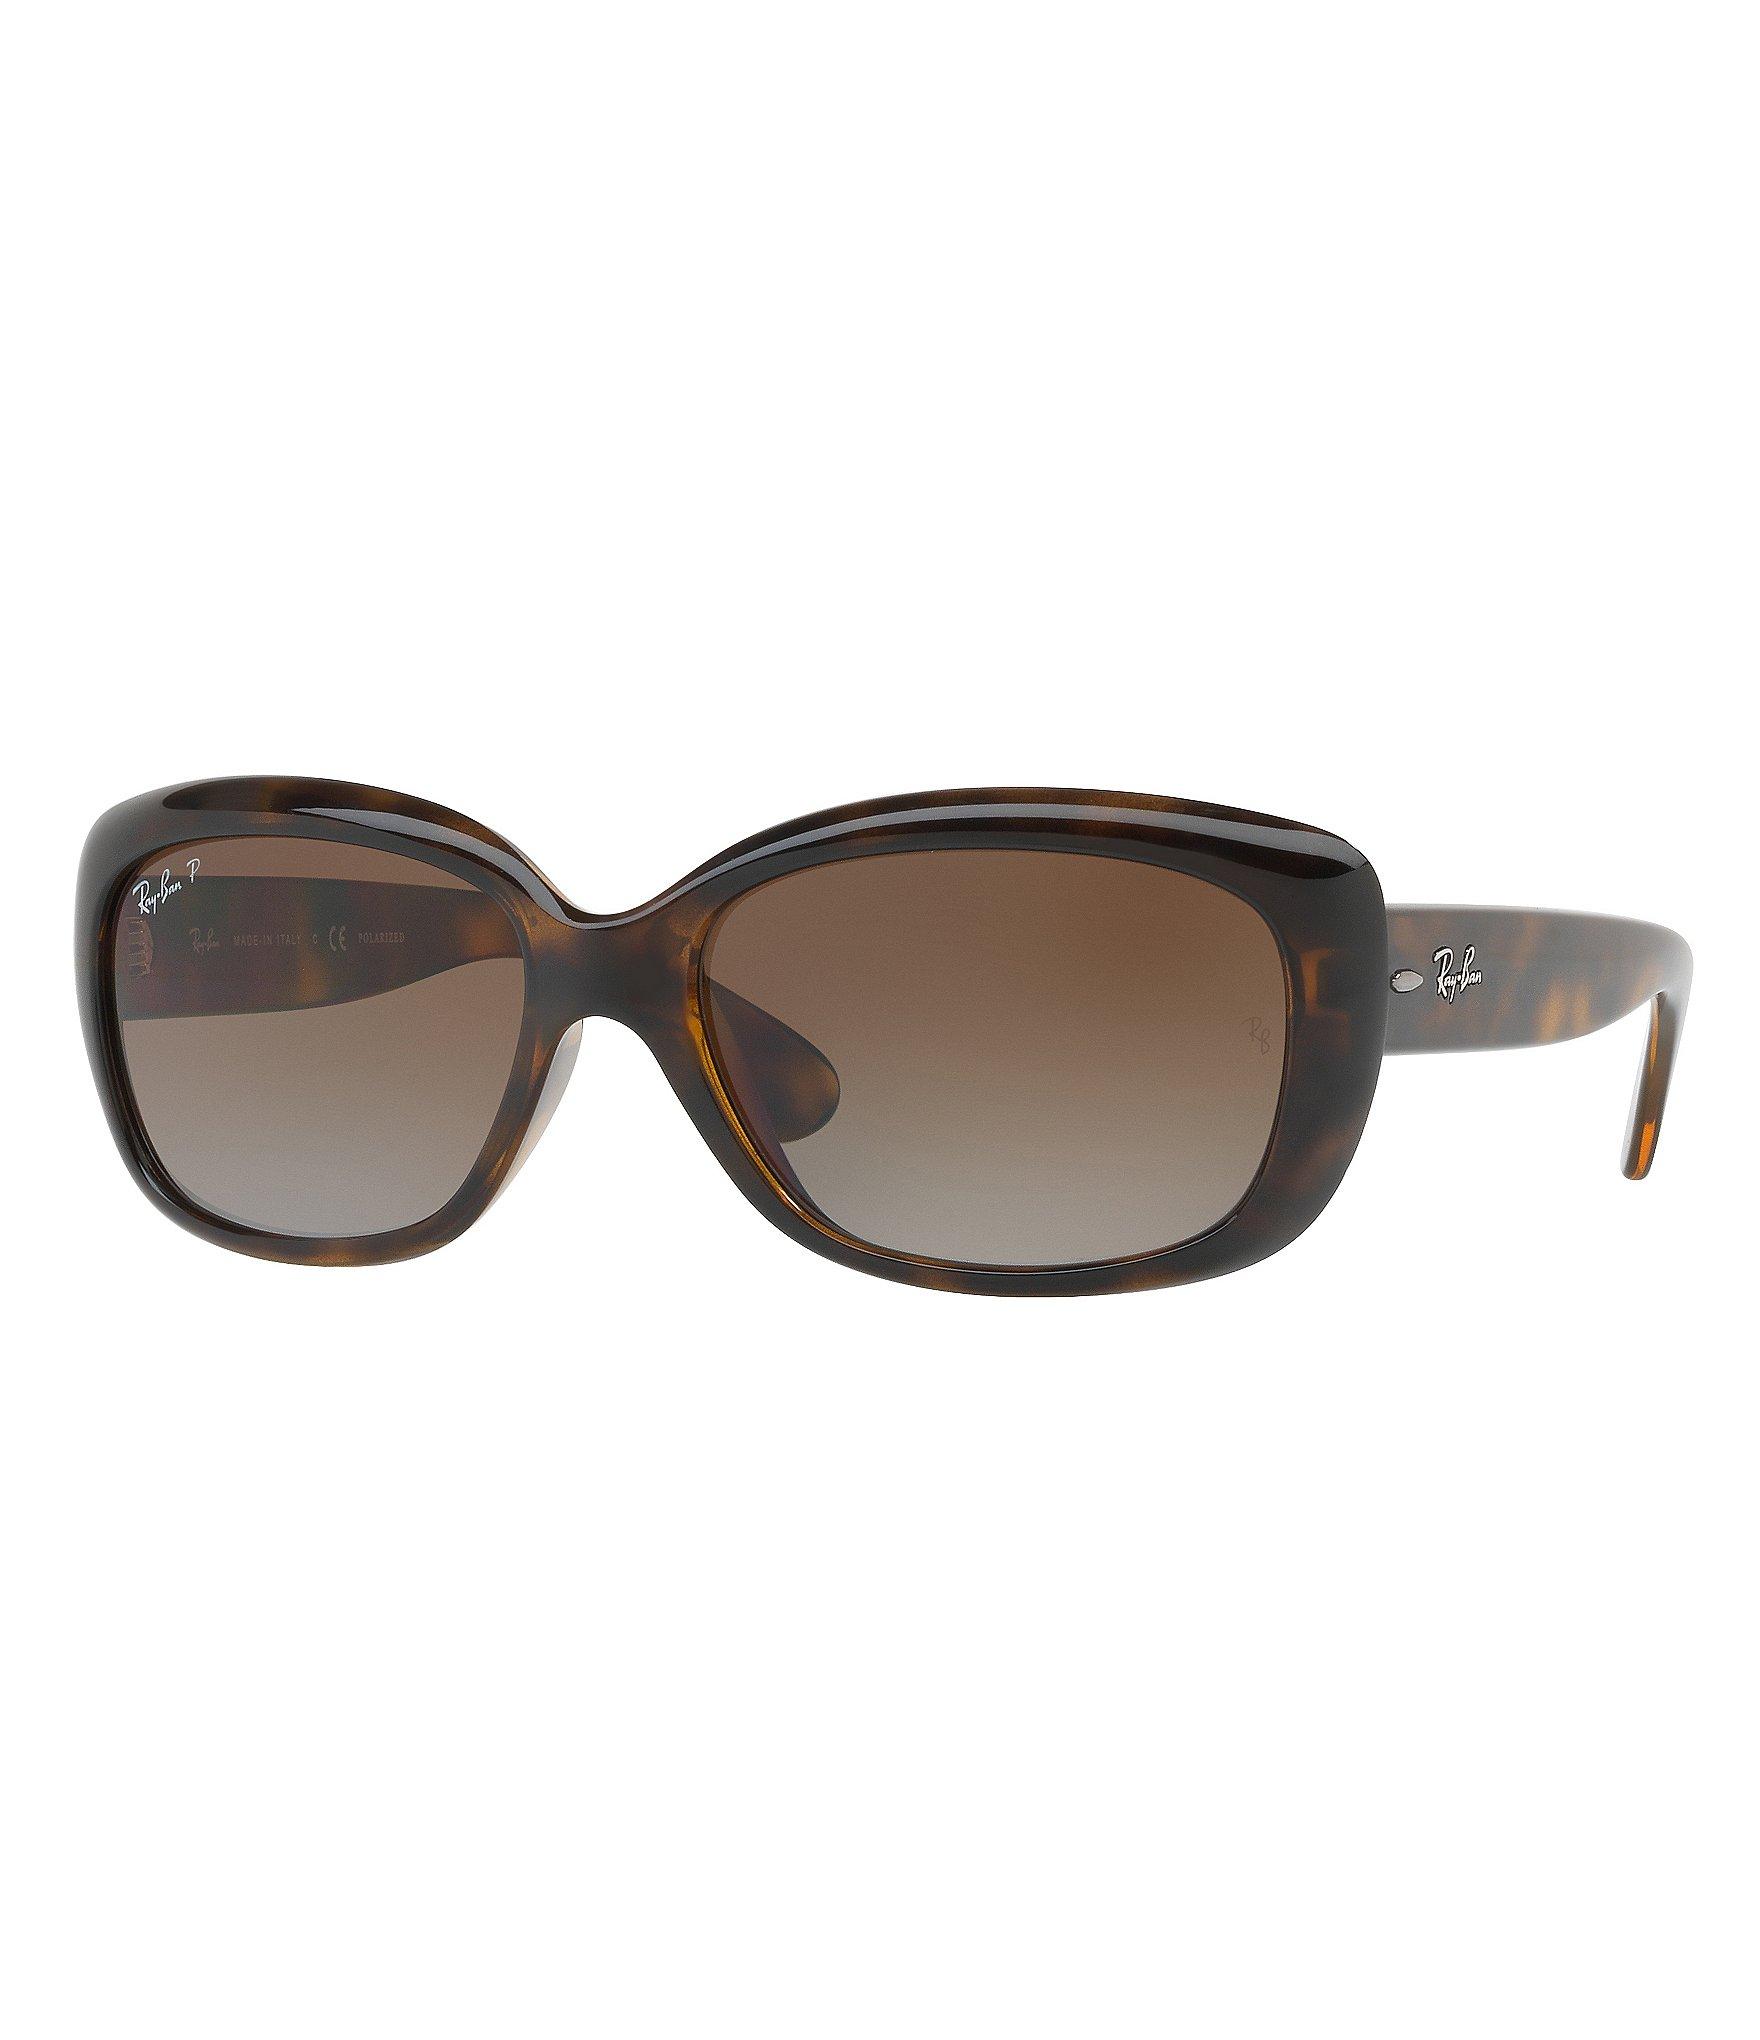 56ea93e567 Ray-Ban Polarized Jackie Ohh Oversized Sunglasses